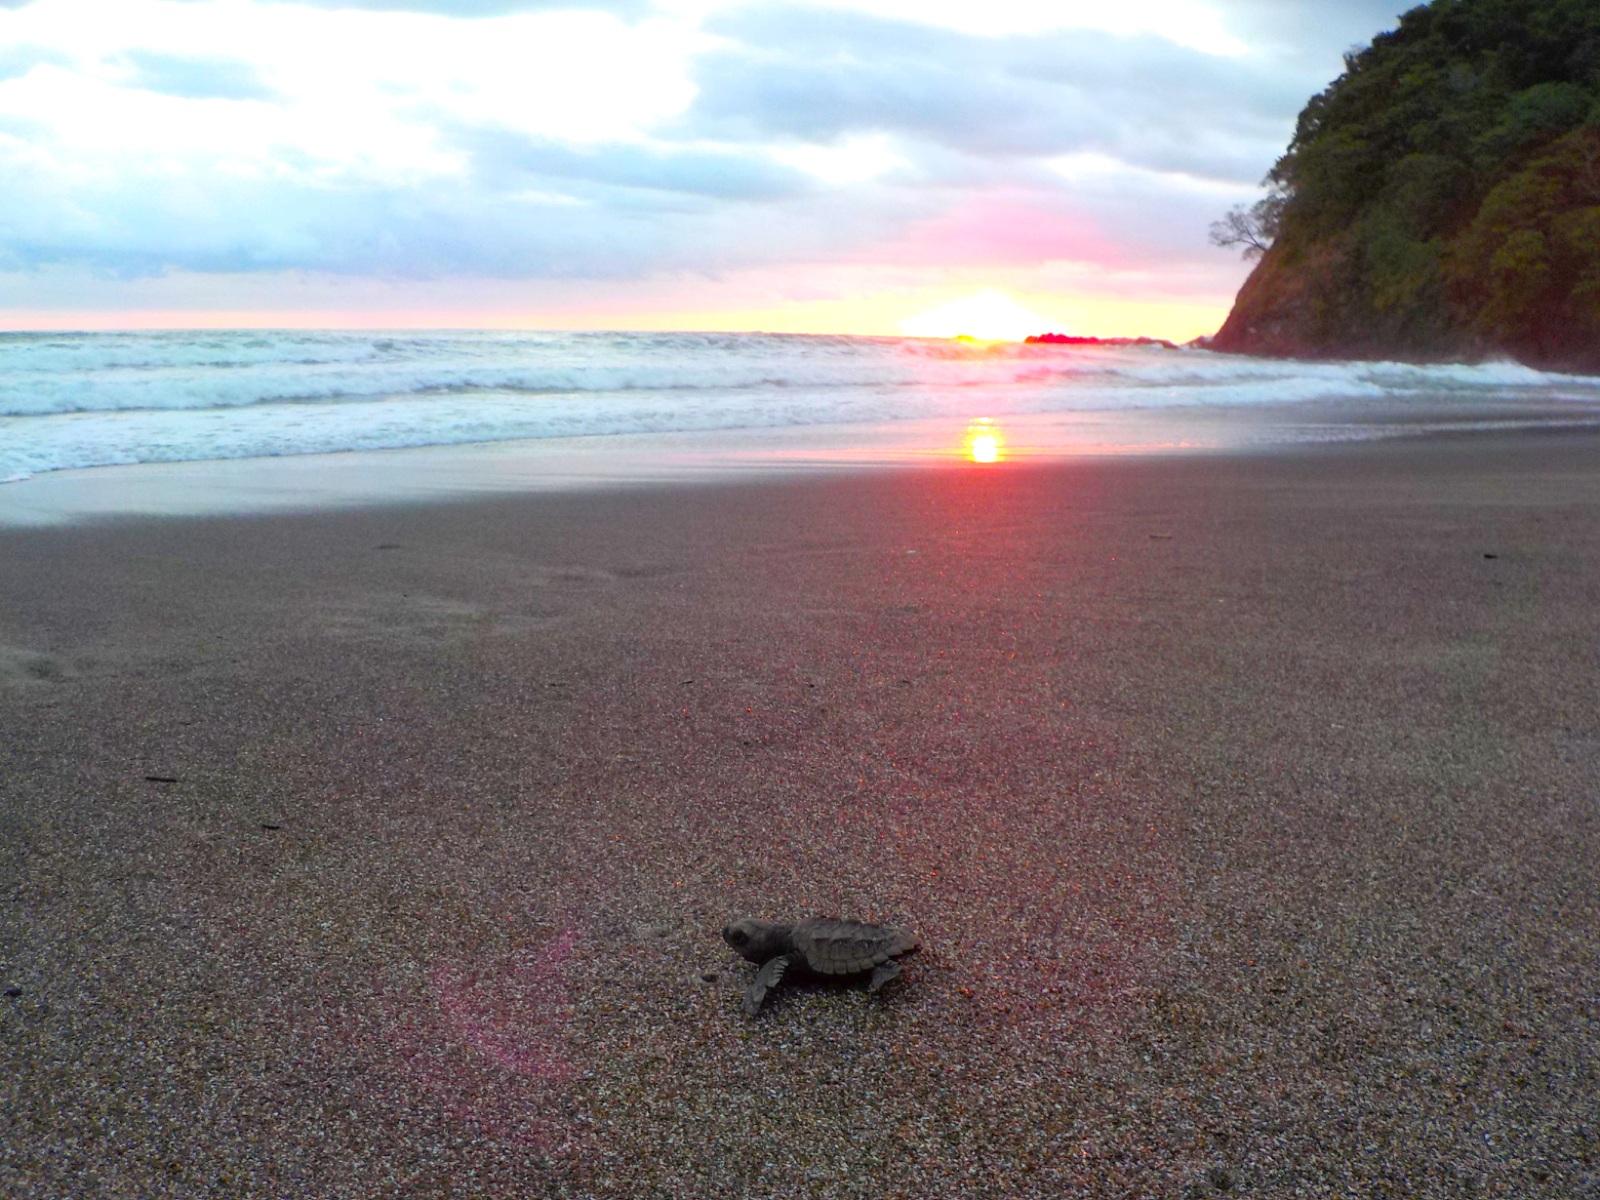 Playa Corozalito, Guanacaste Costa Rica